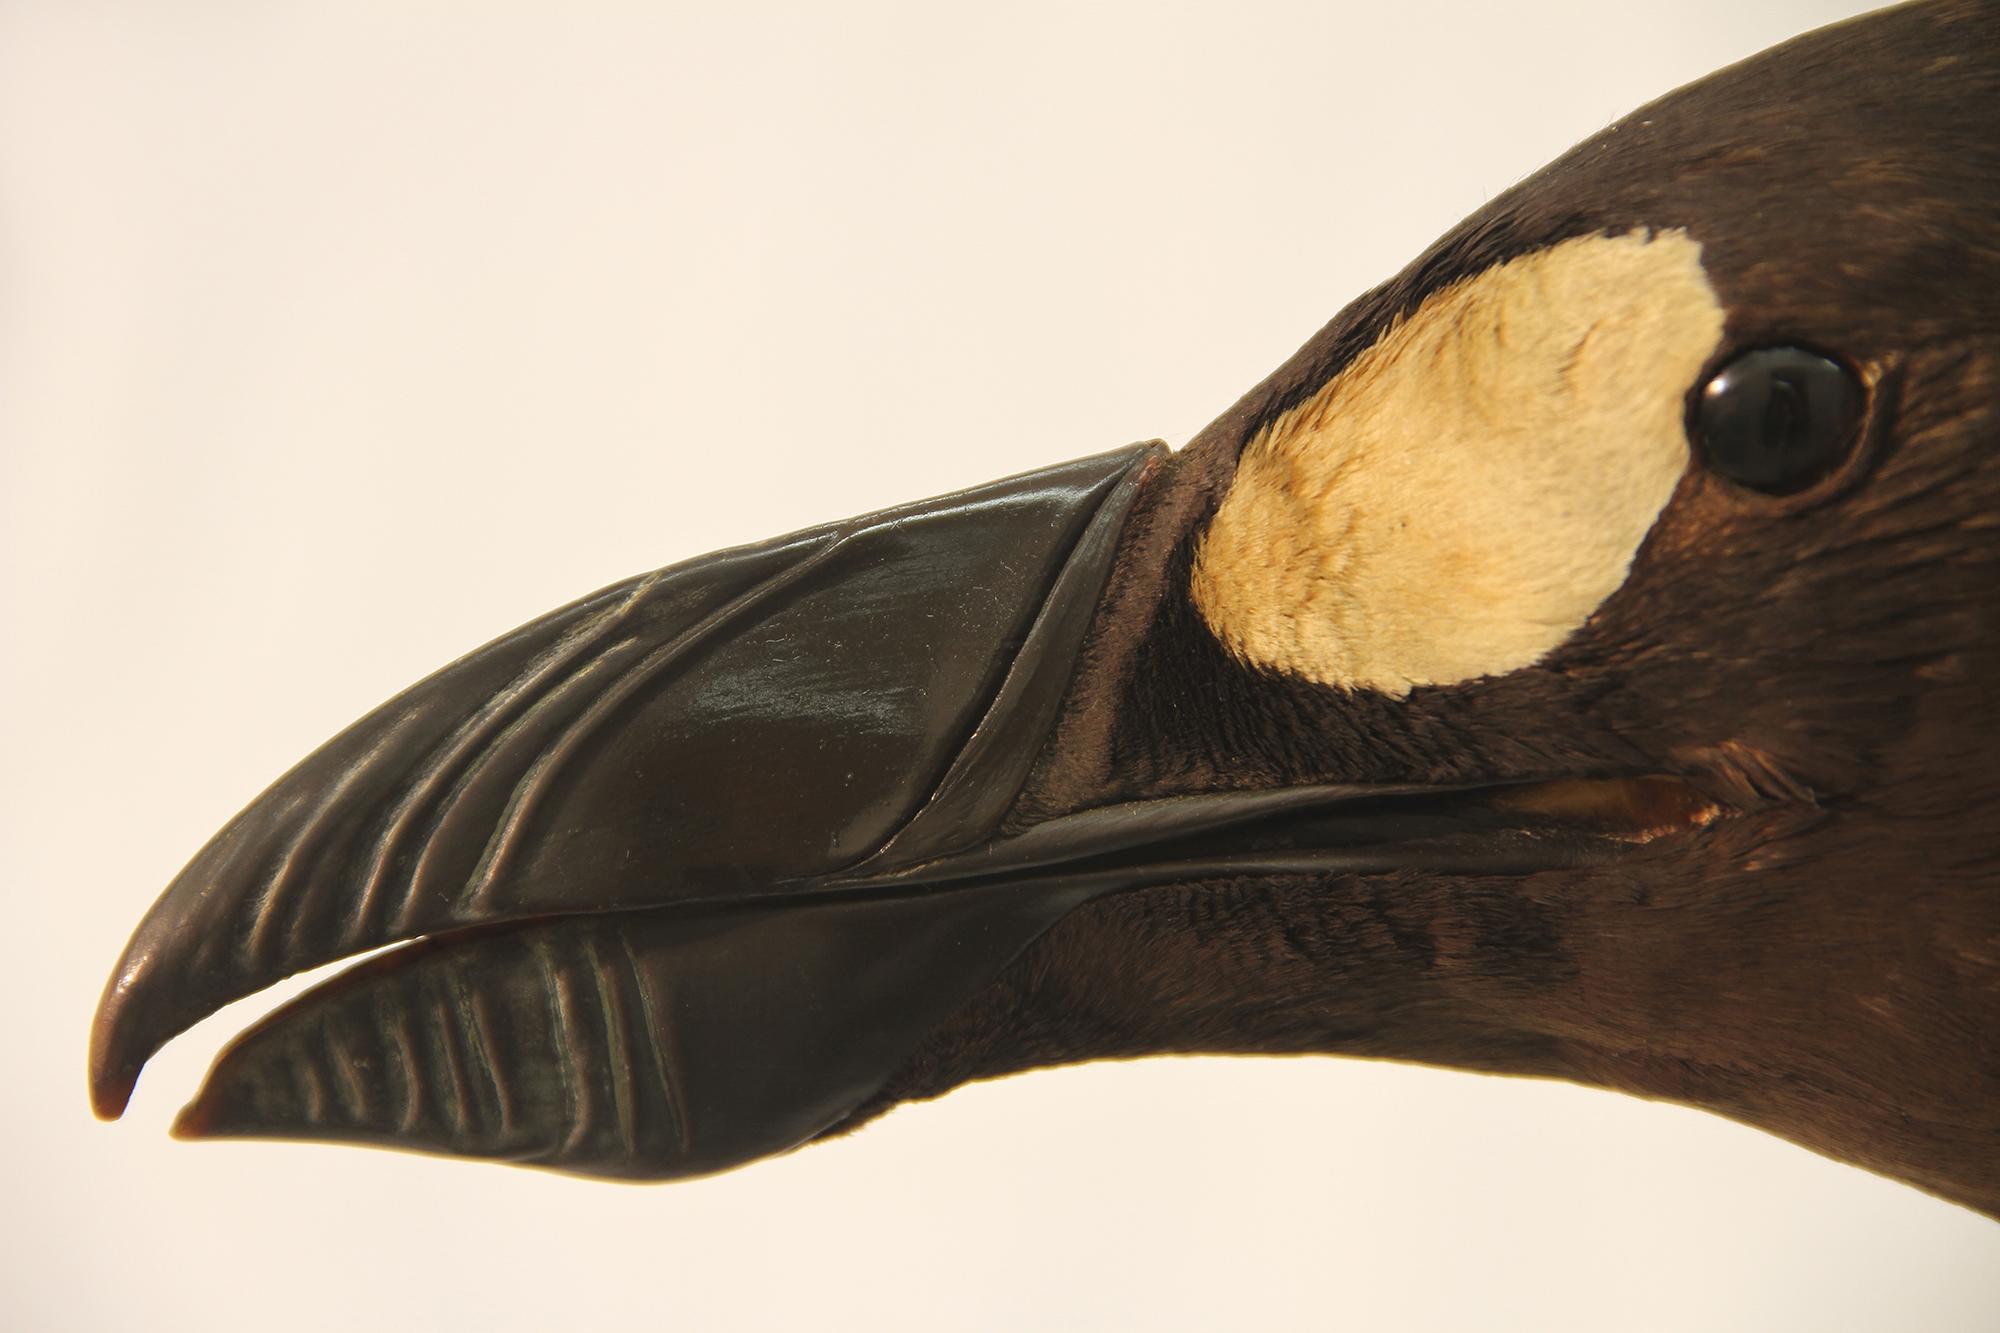 """Beak"" by Todd McGrain. Photograph. Lent by the artist."